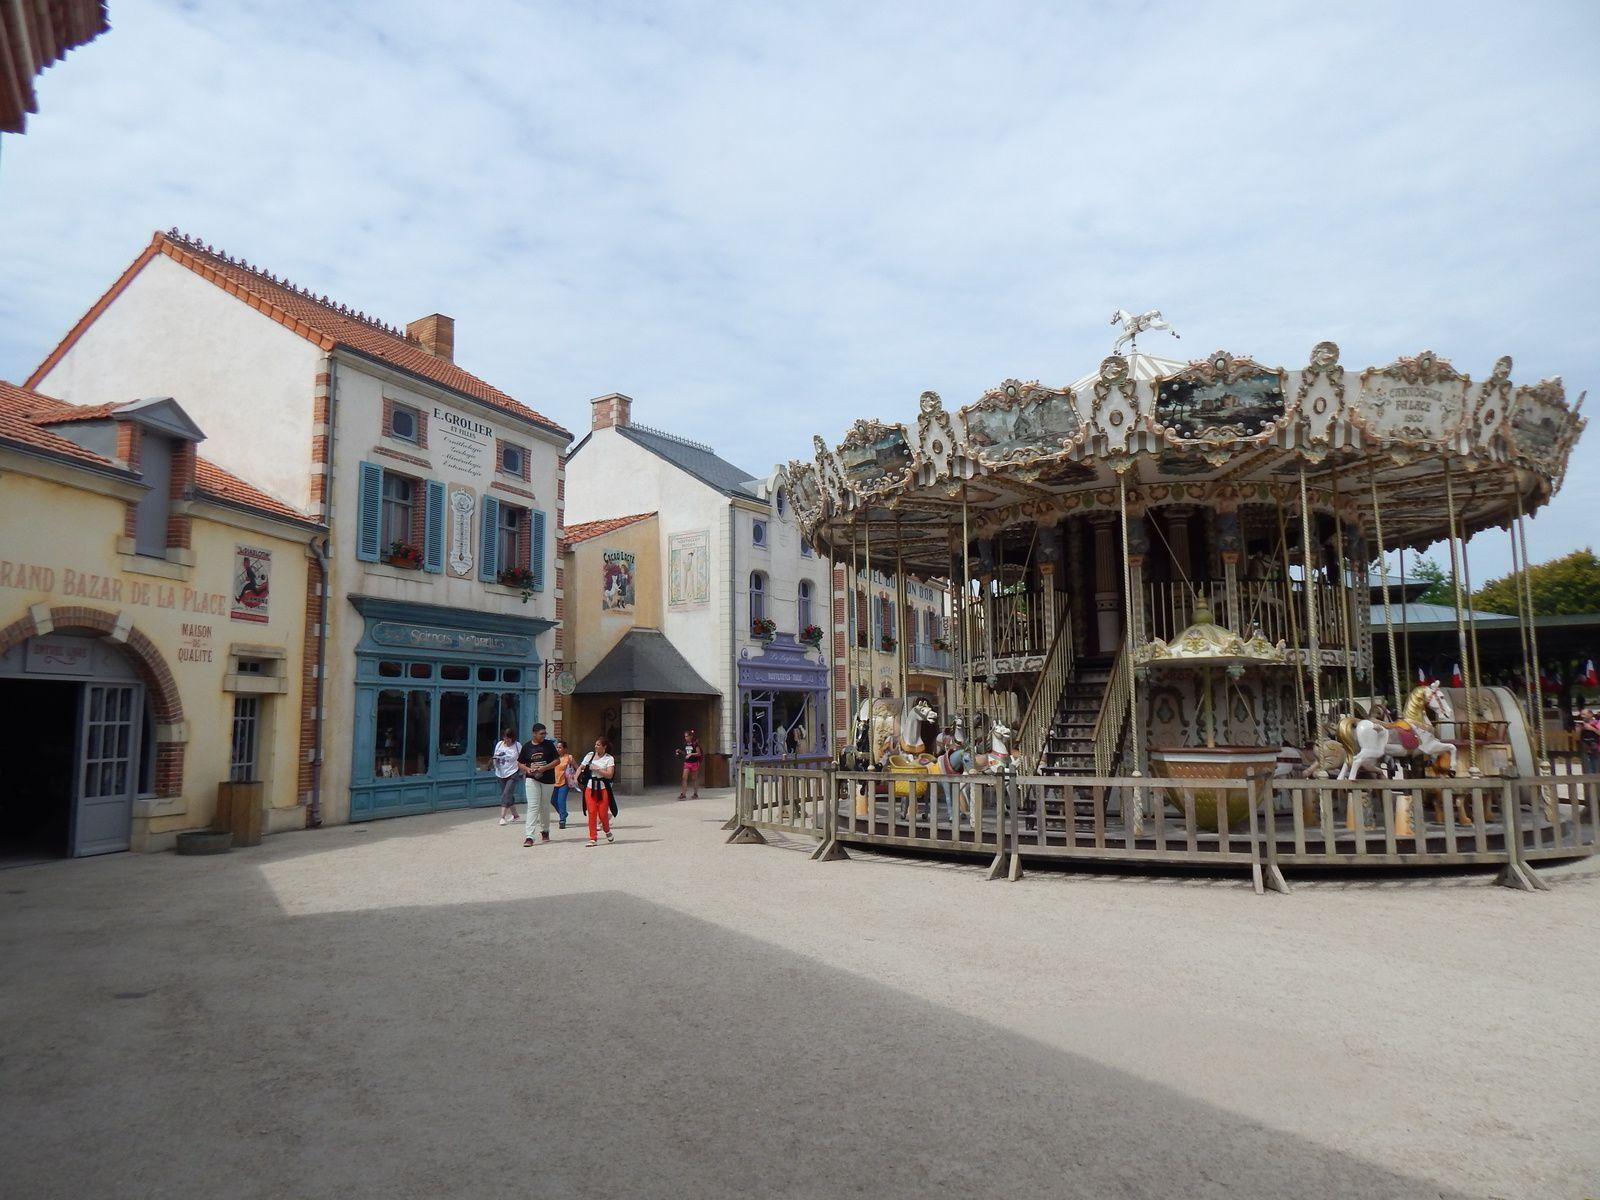 Le bourg 1900